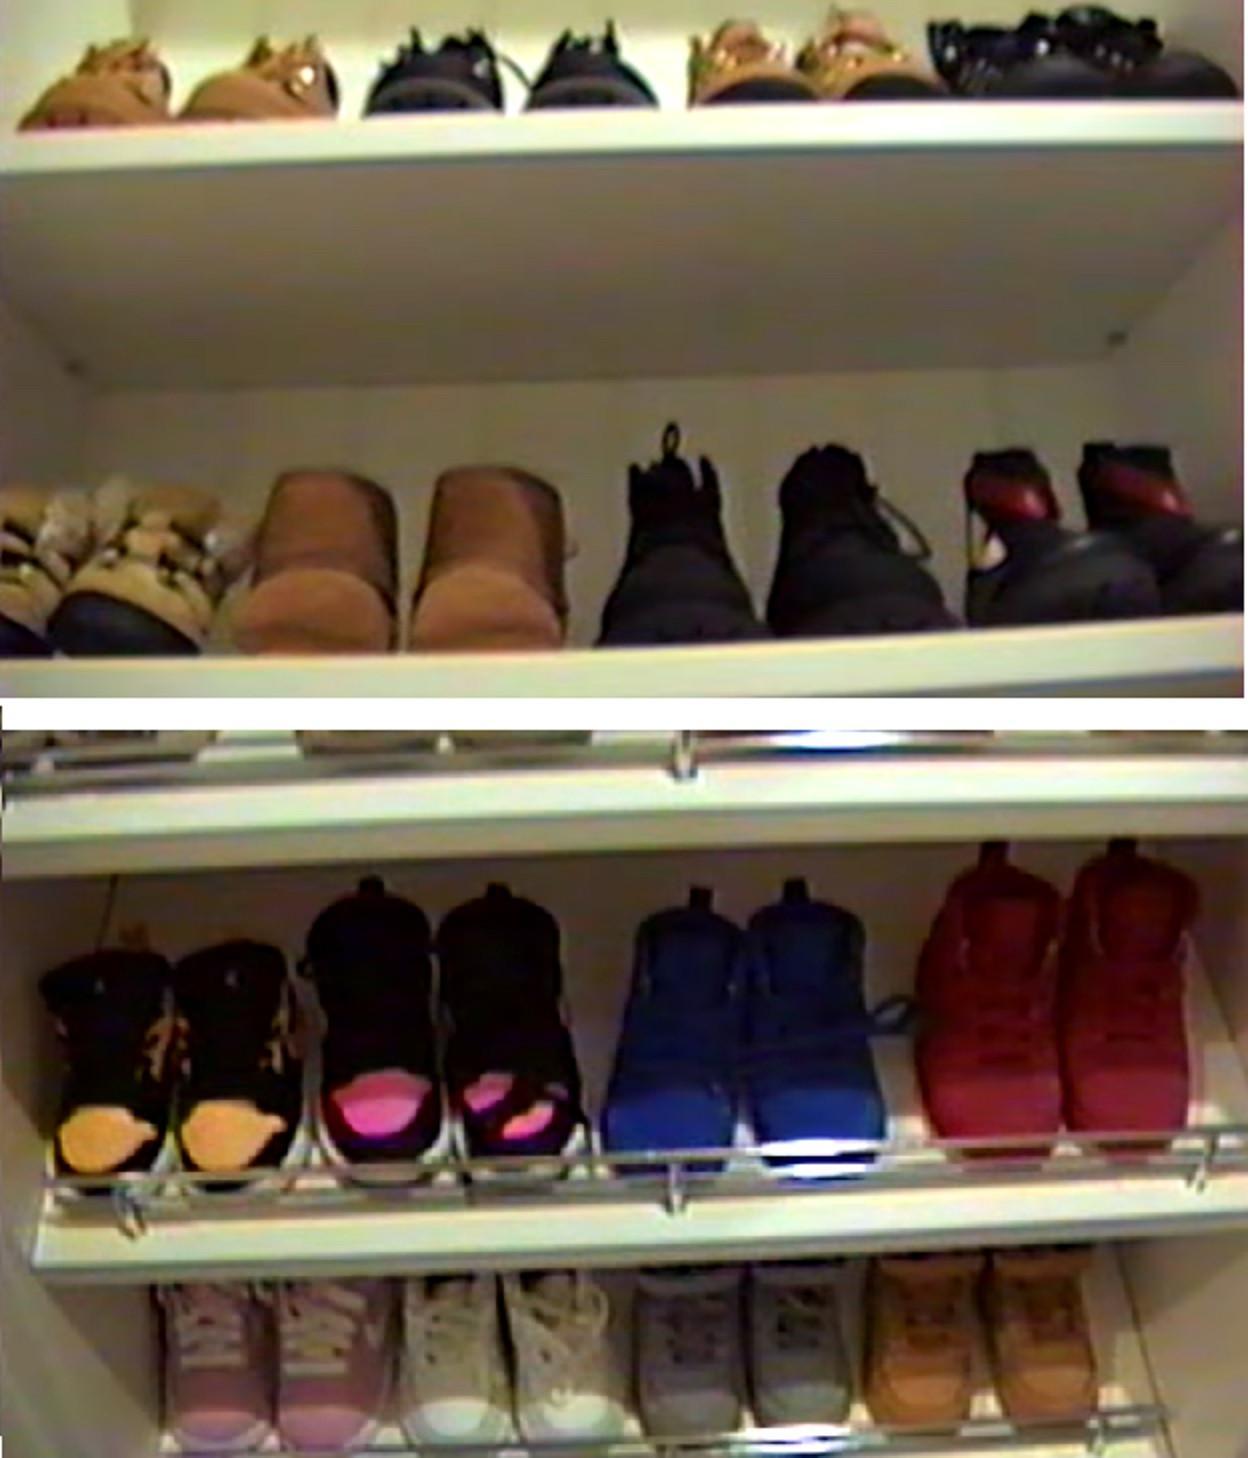 Sebagian koleksi sepatu putri Kylie Jenner (YouTube/ kyliejenner)